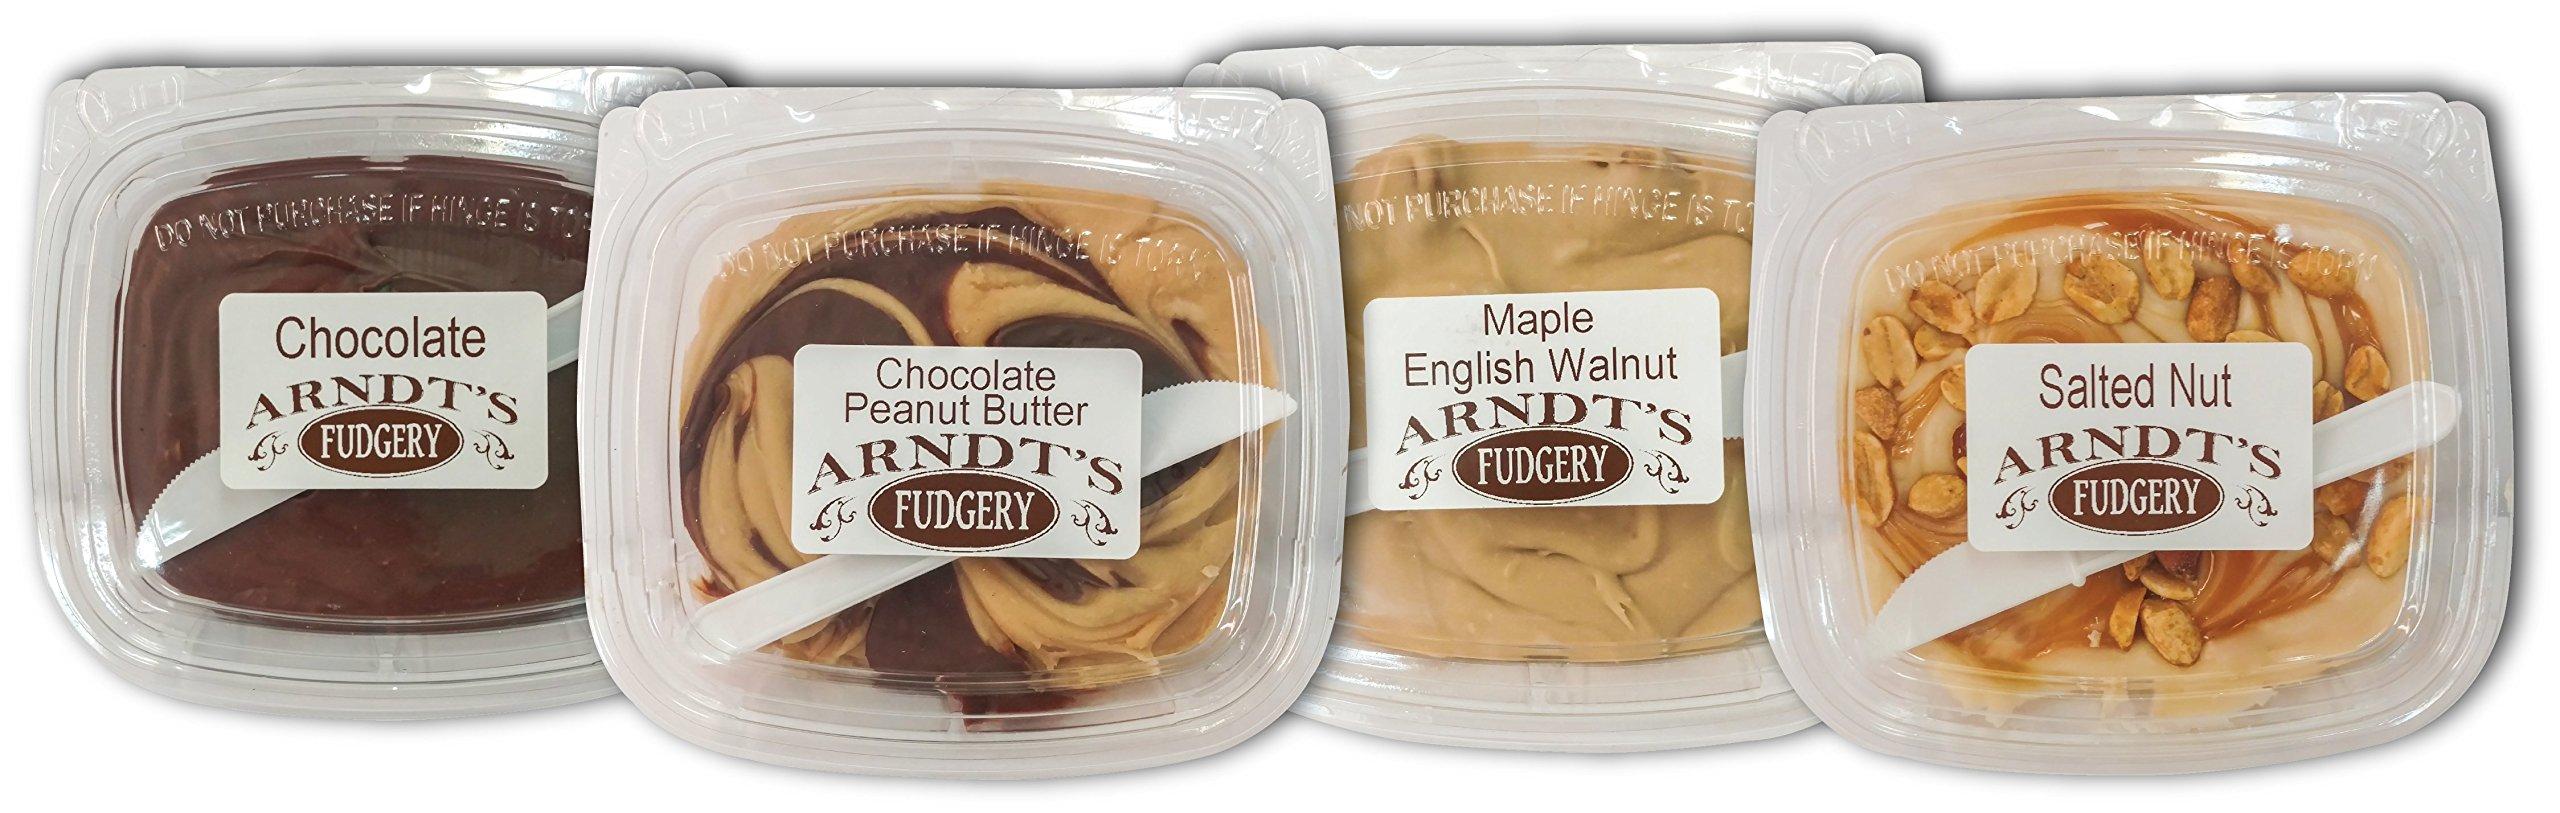 7 Oz Tubs Of Fudge (Four 7 Oz Tubs Of Fudge - Four Great Flavors)